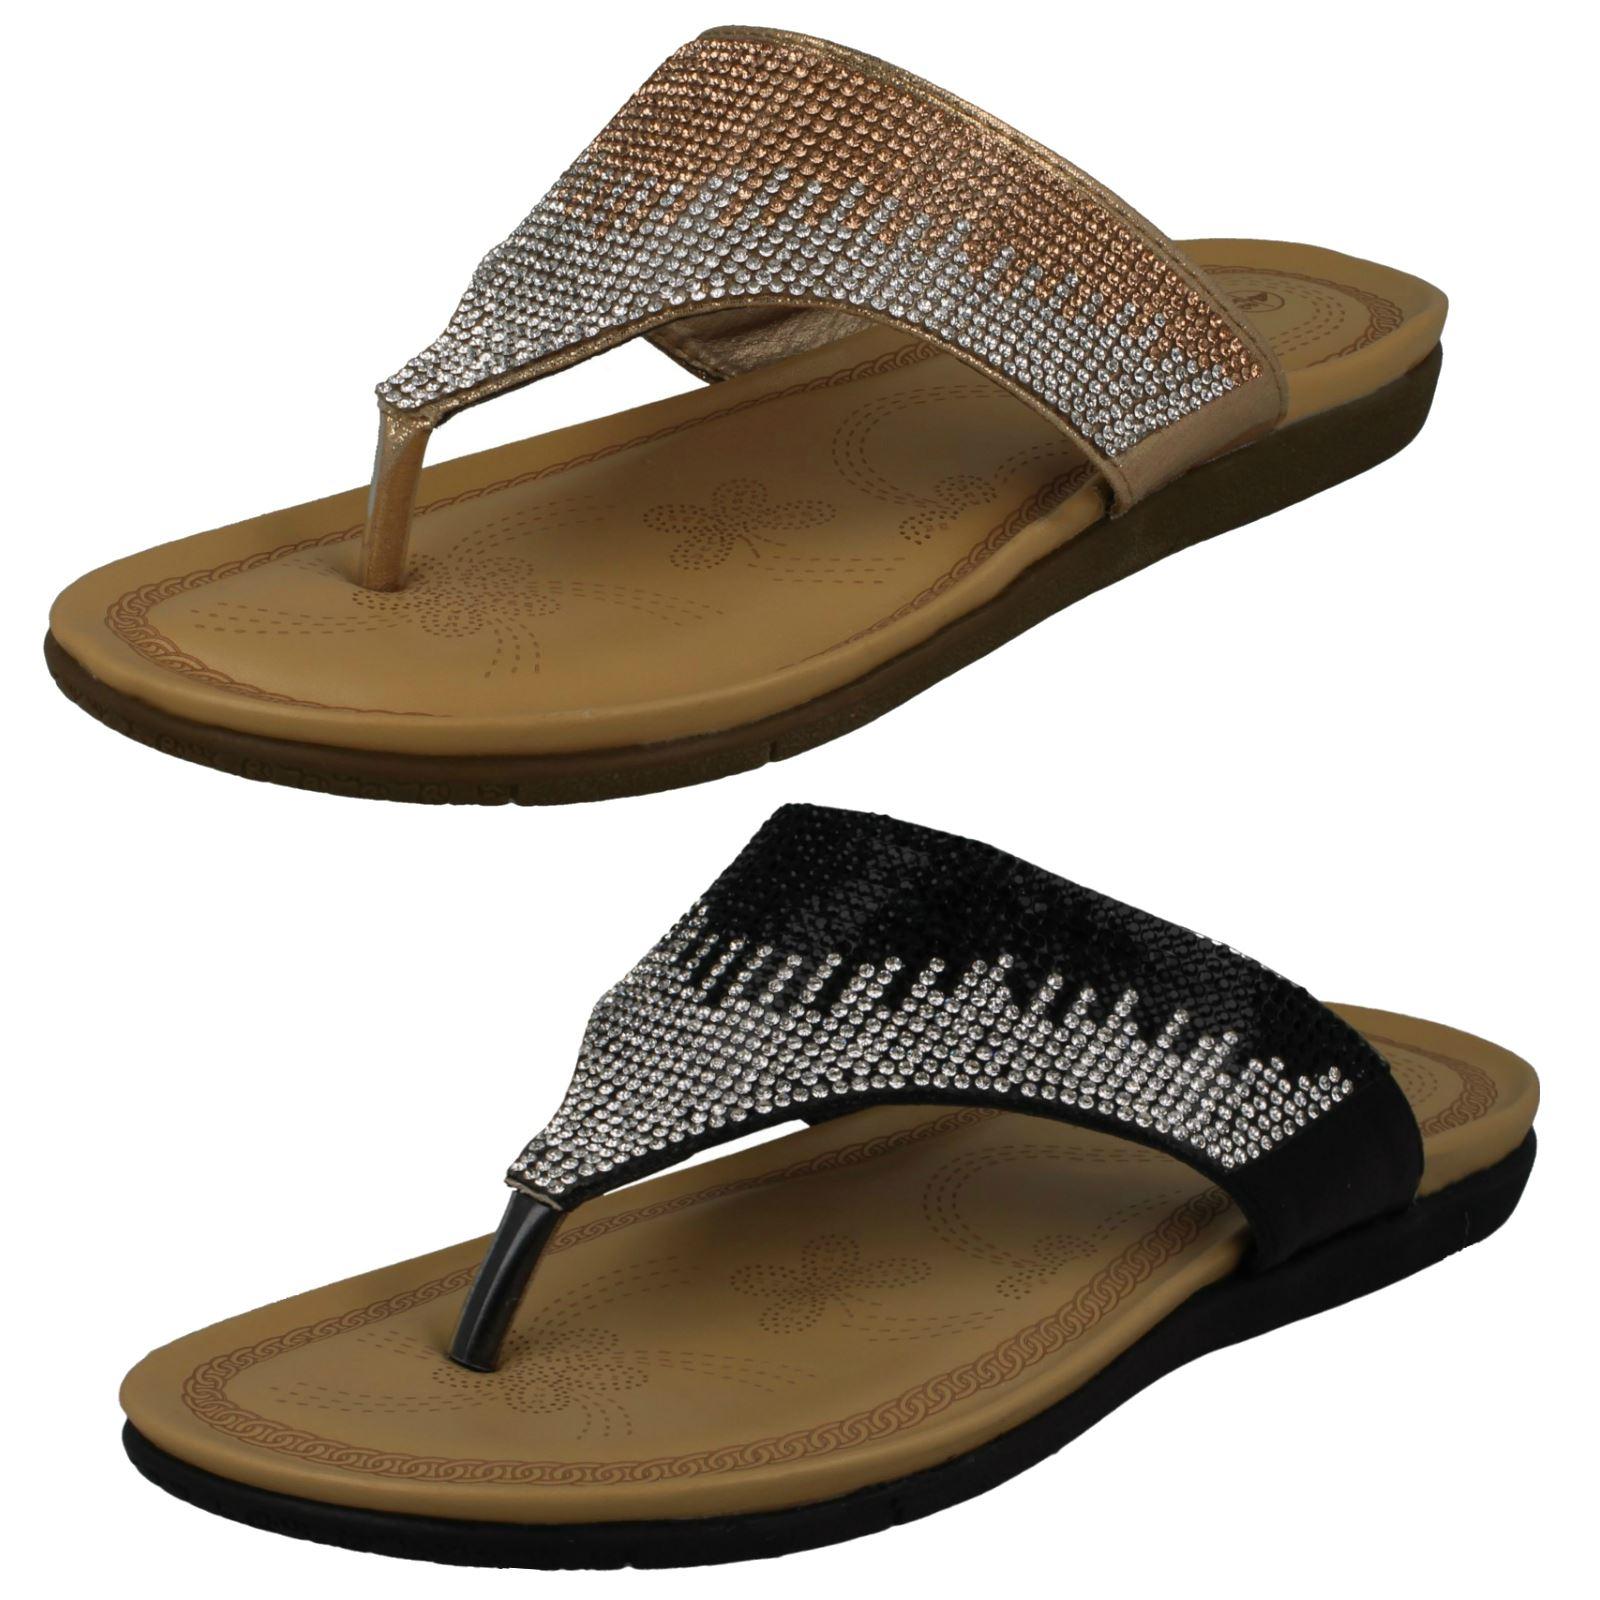 Ladies Savannah Toepost Sandals With Diamante Detail